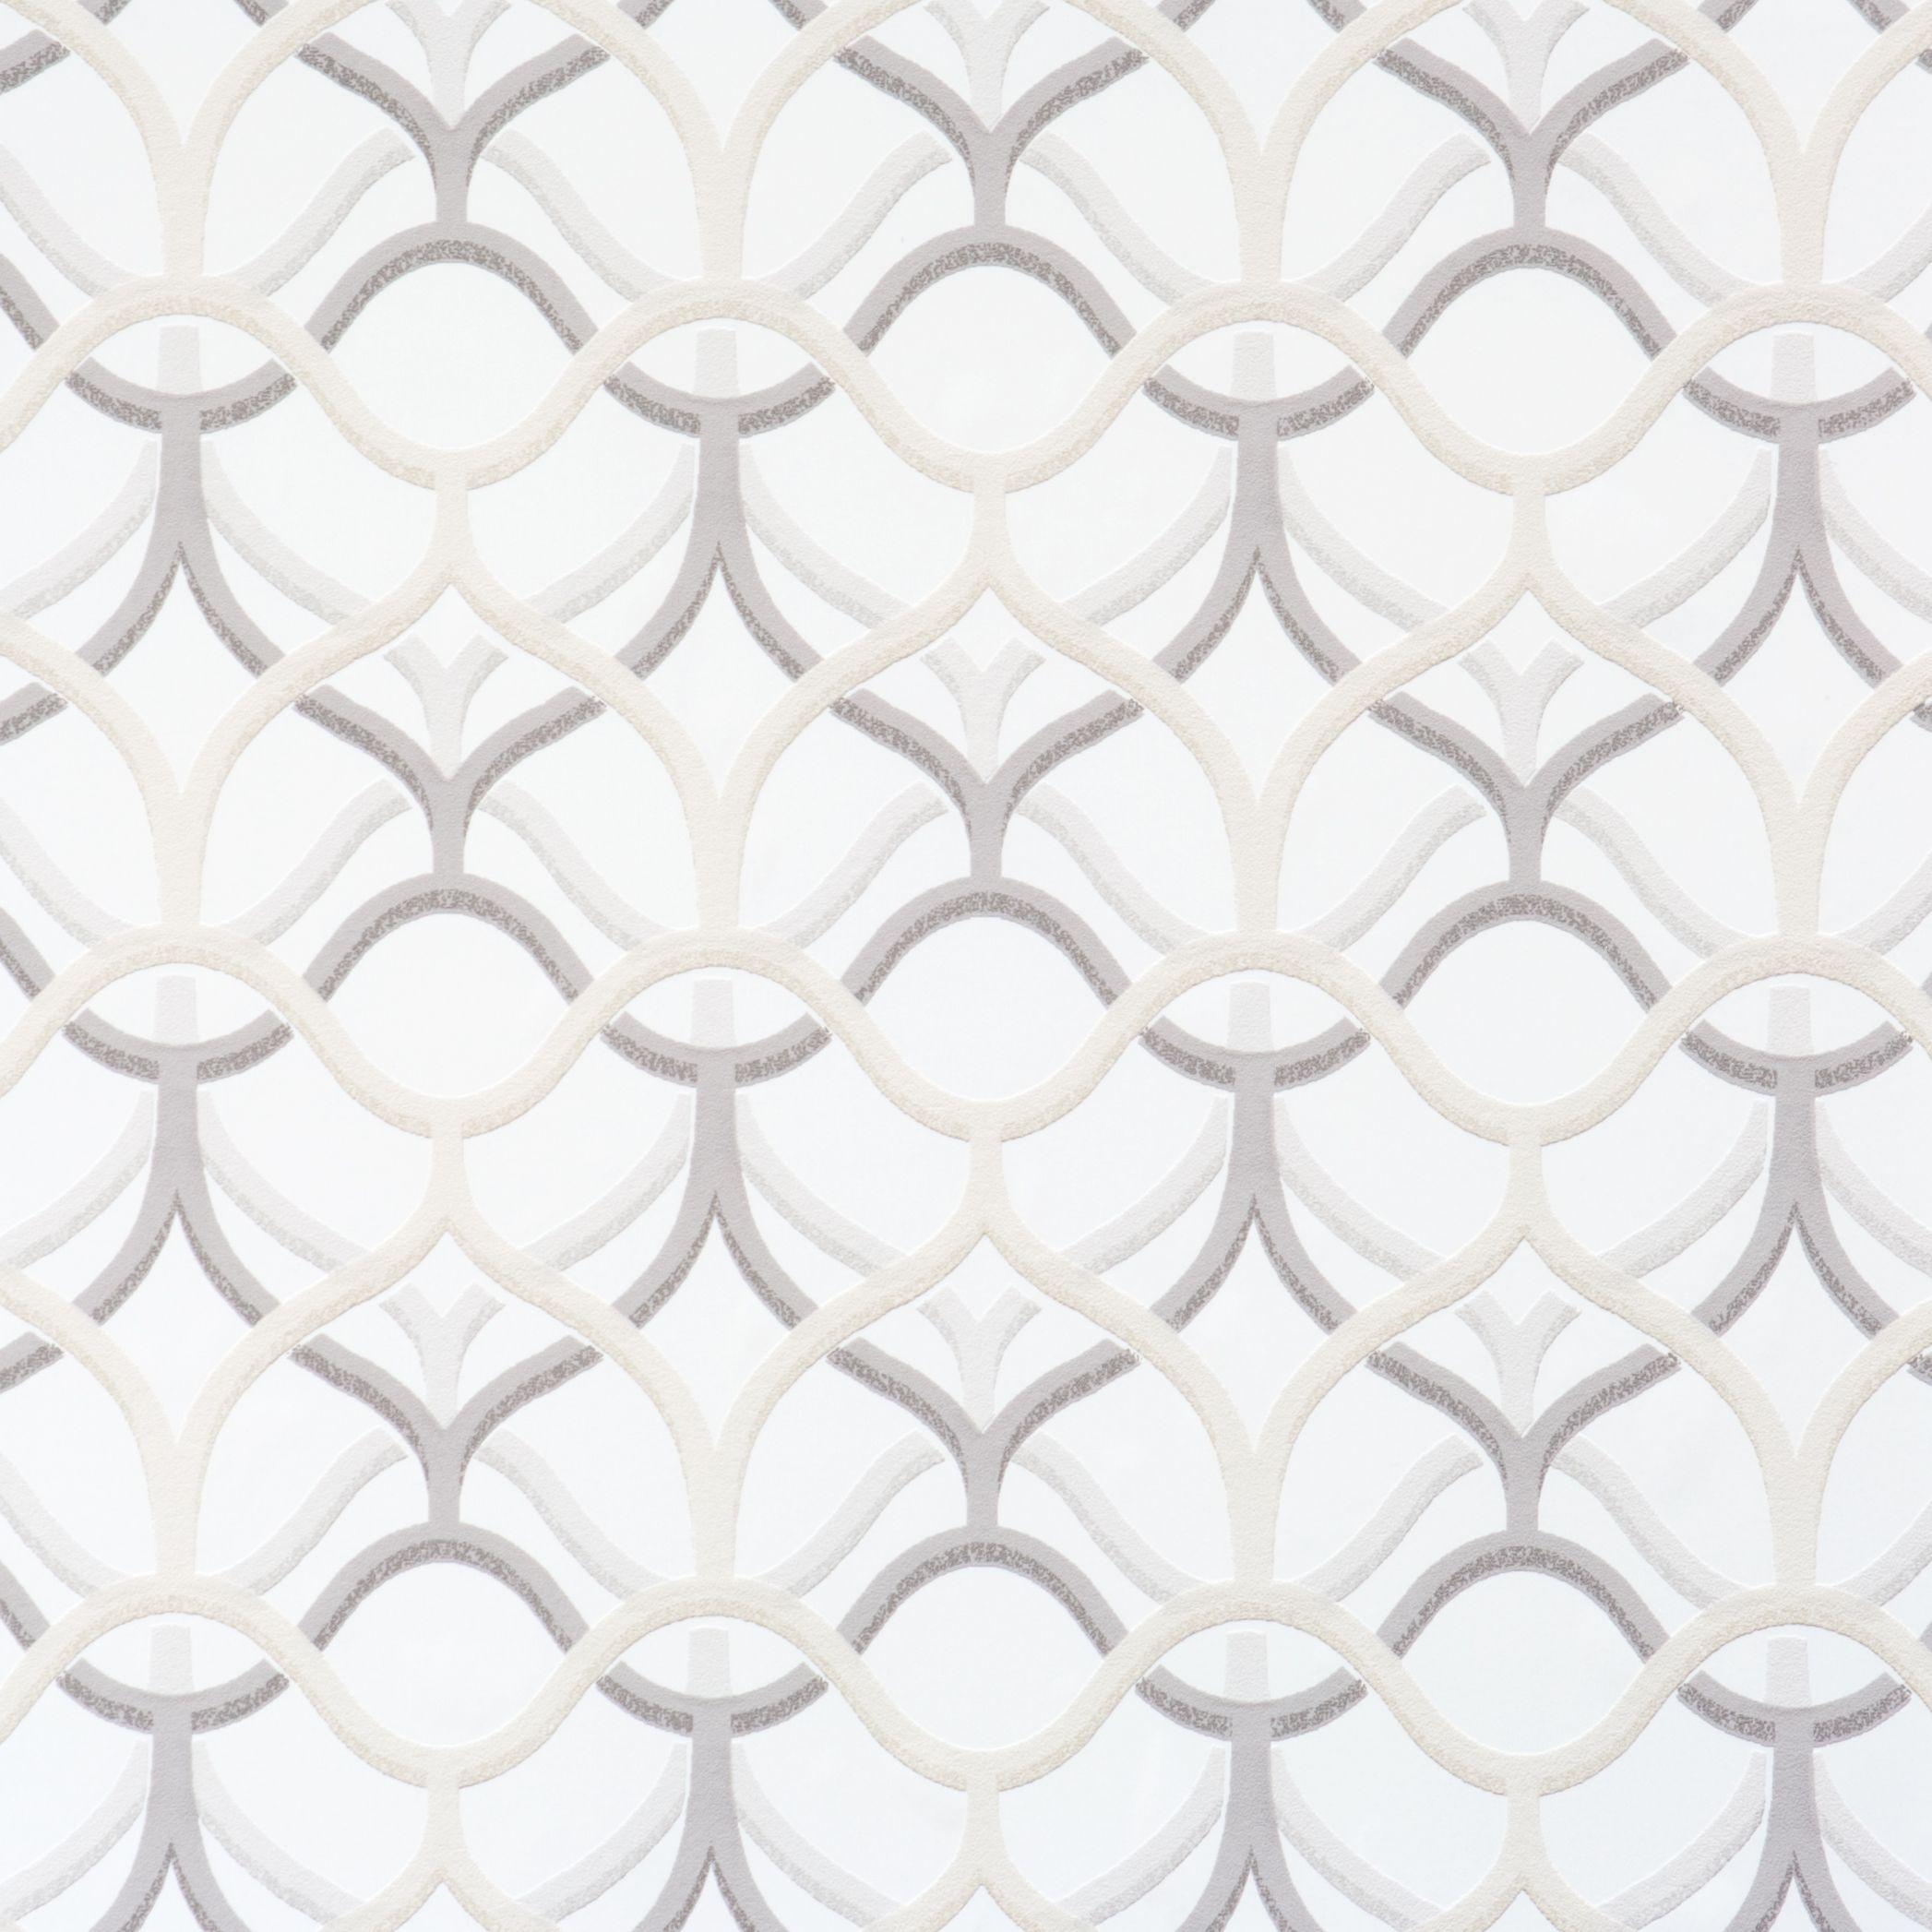 Rising Quatrefoils, White & Grey Geometric Wallpaper by